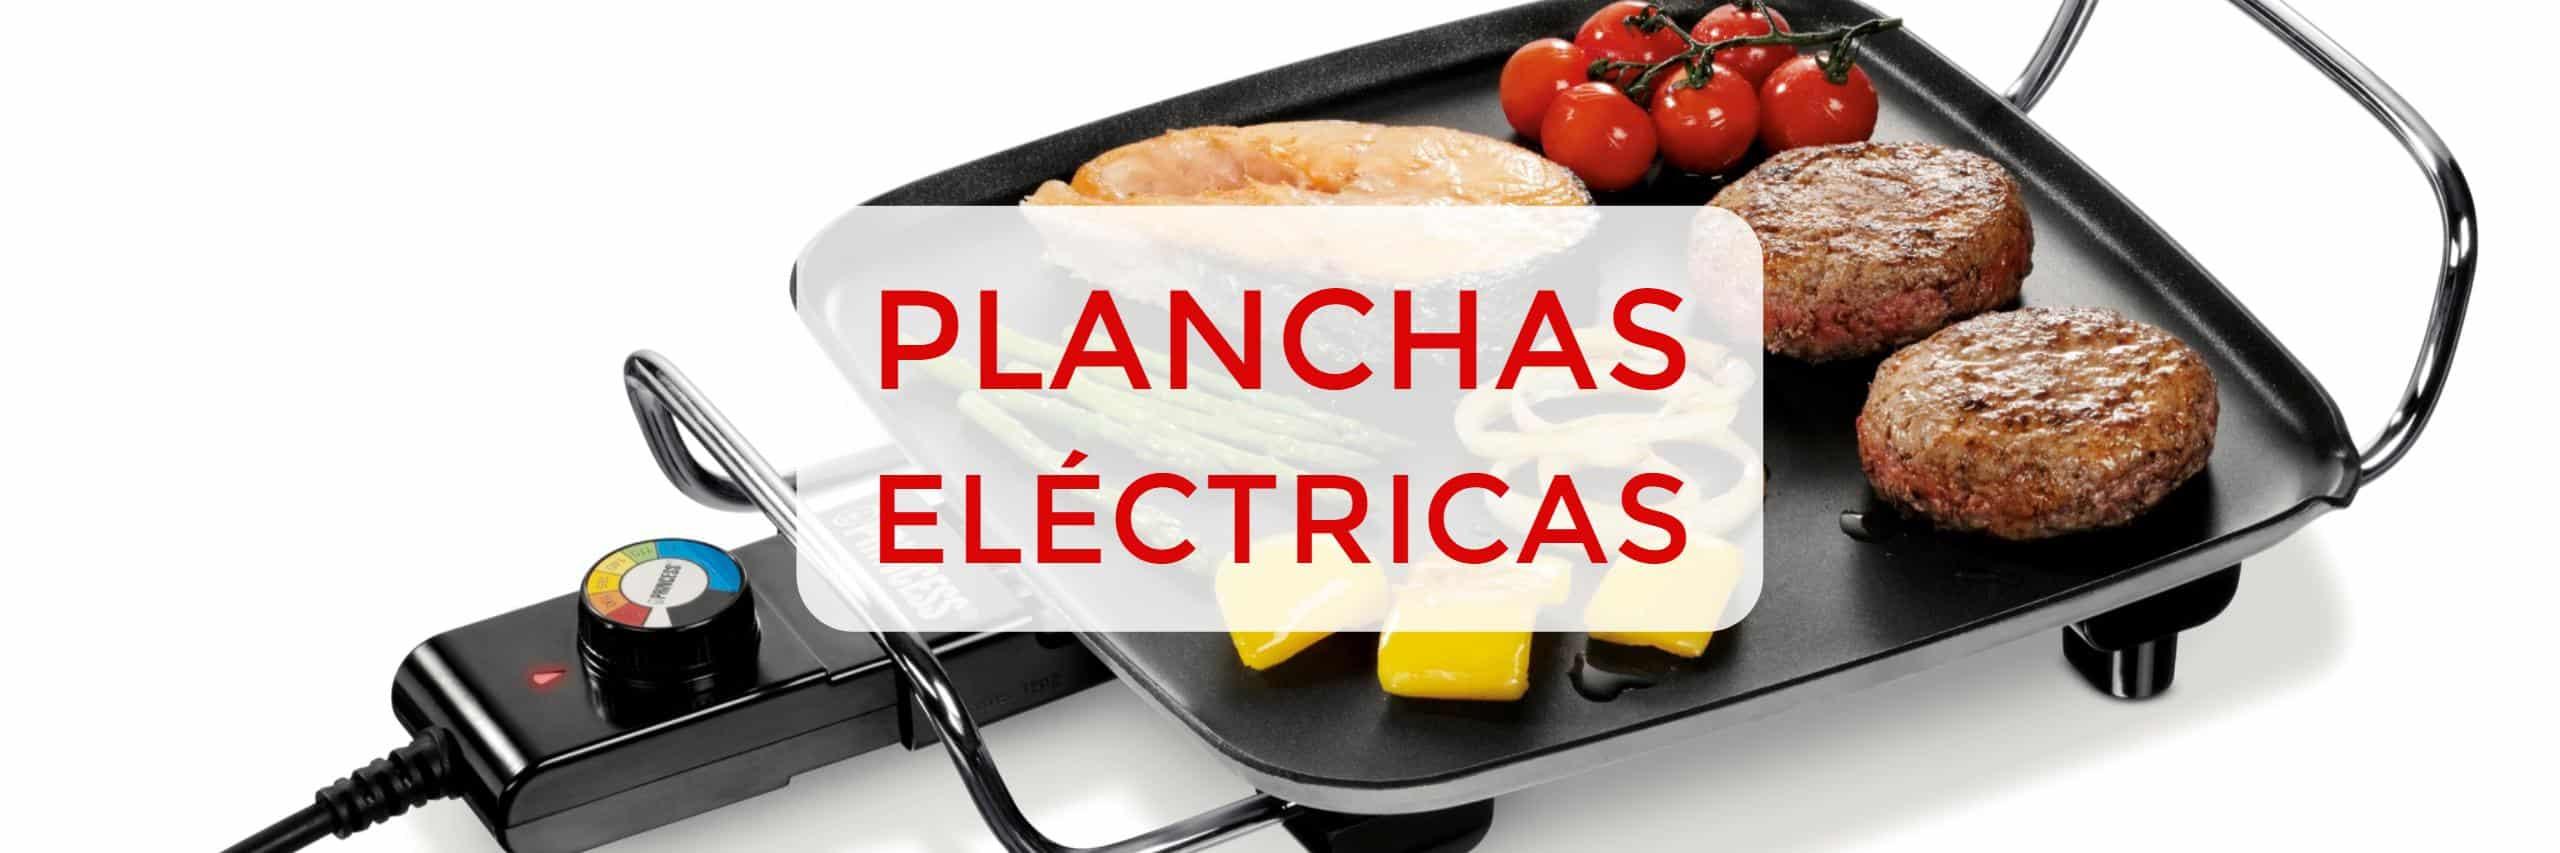 Planchas electricas for Planchas de cocina electricas